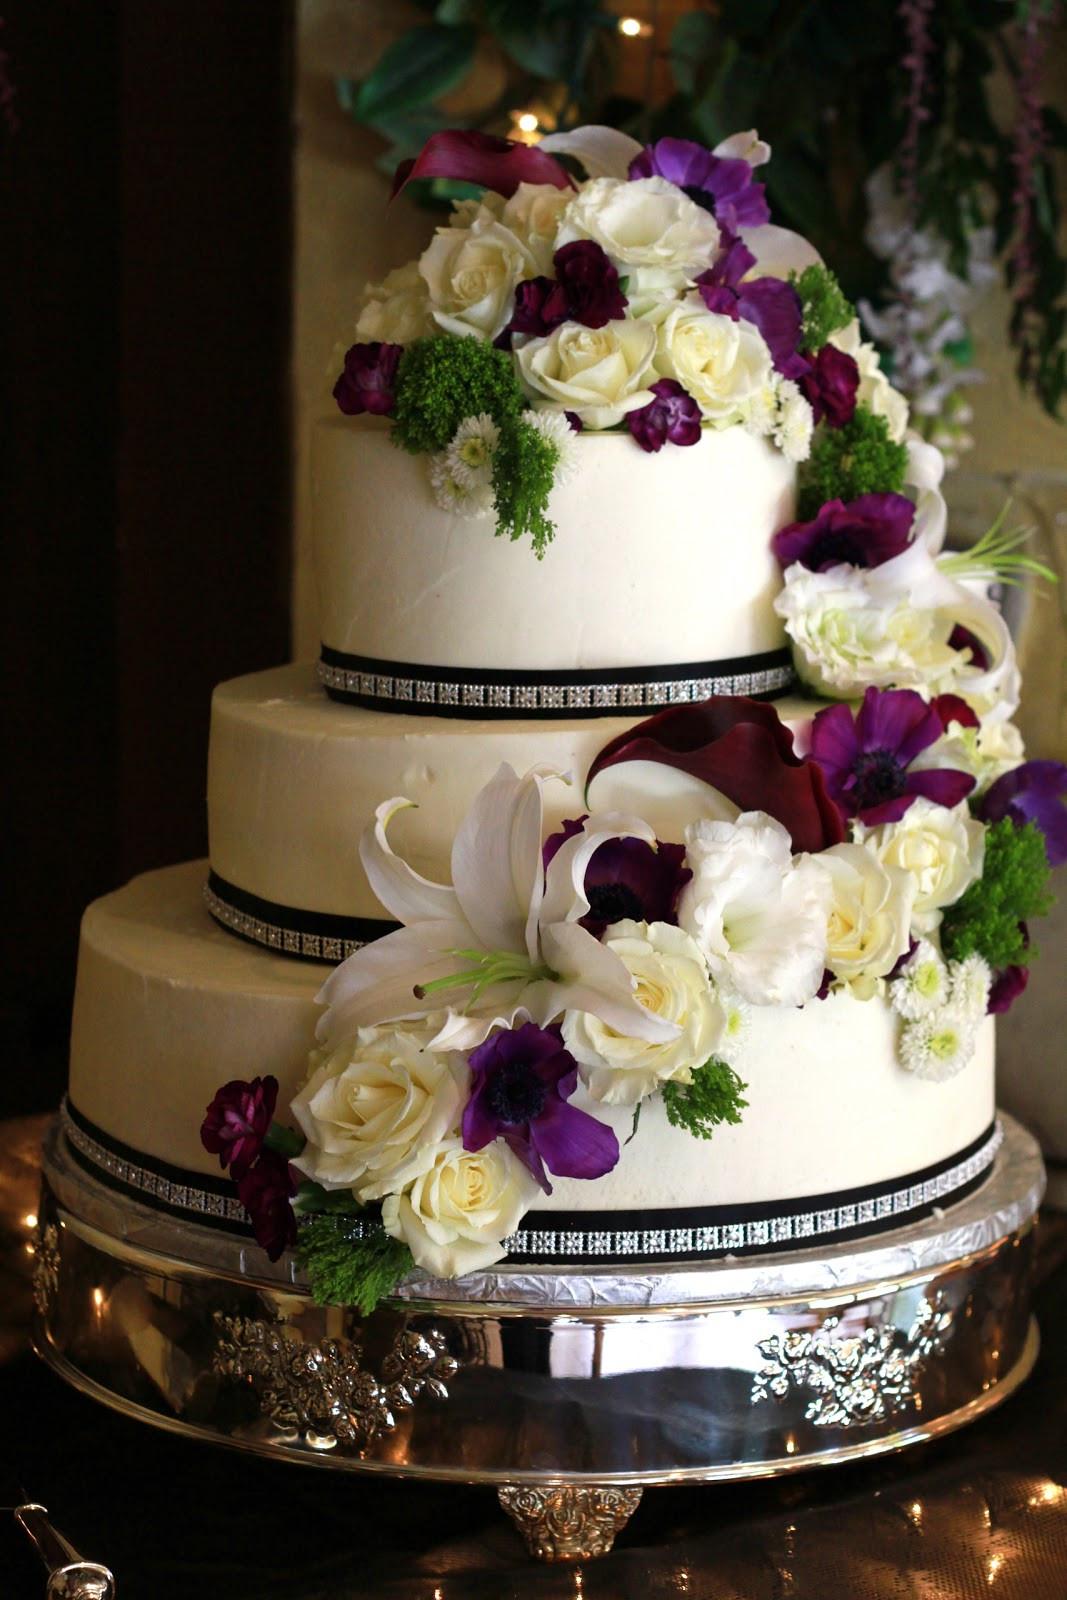 Wedding Cakes Flowers  Exquisite Cookies 3 Tier wedding cake with fresh flowers